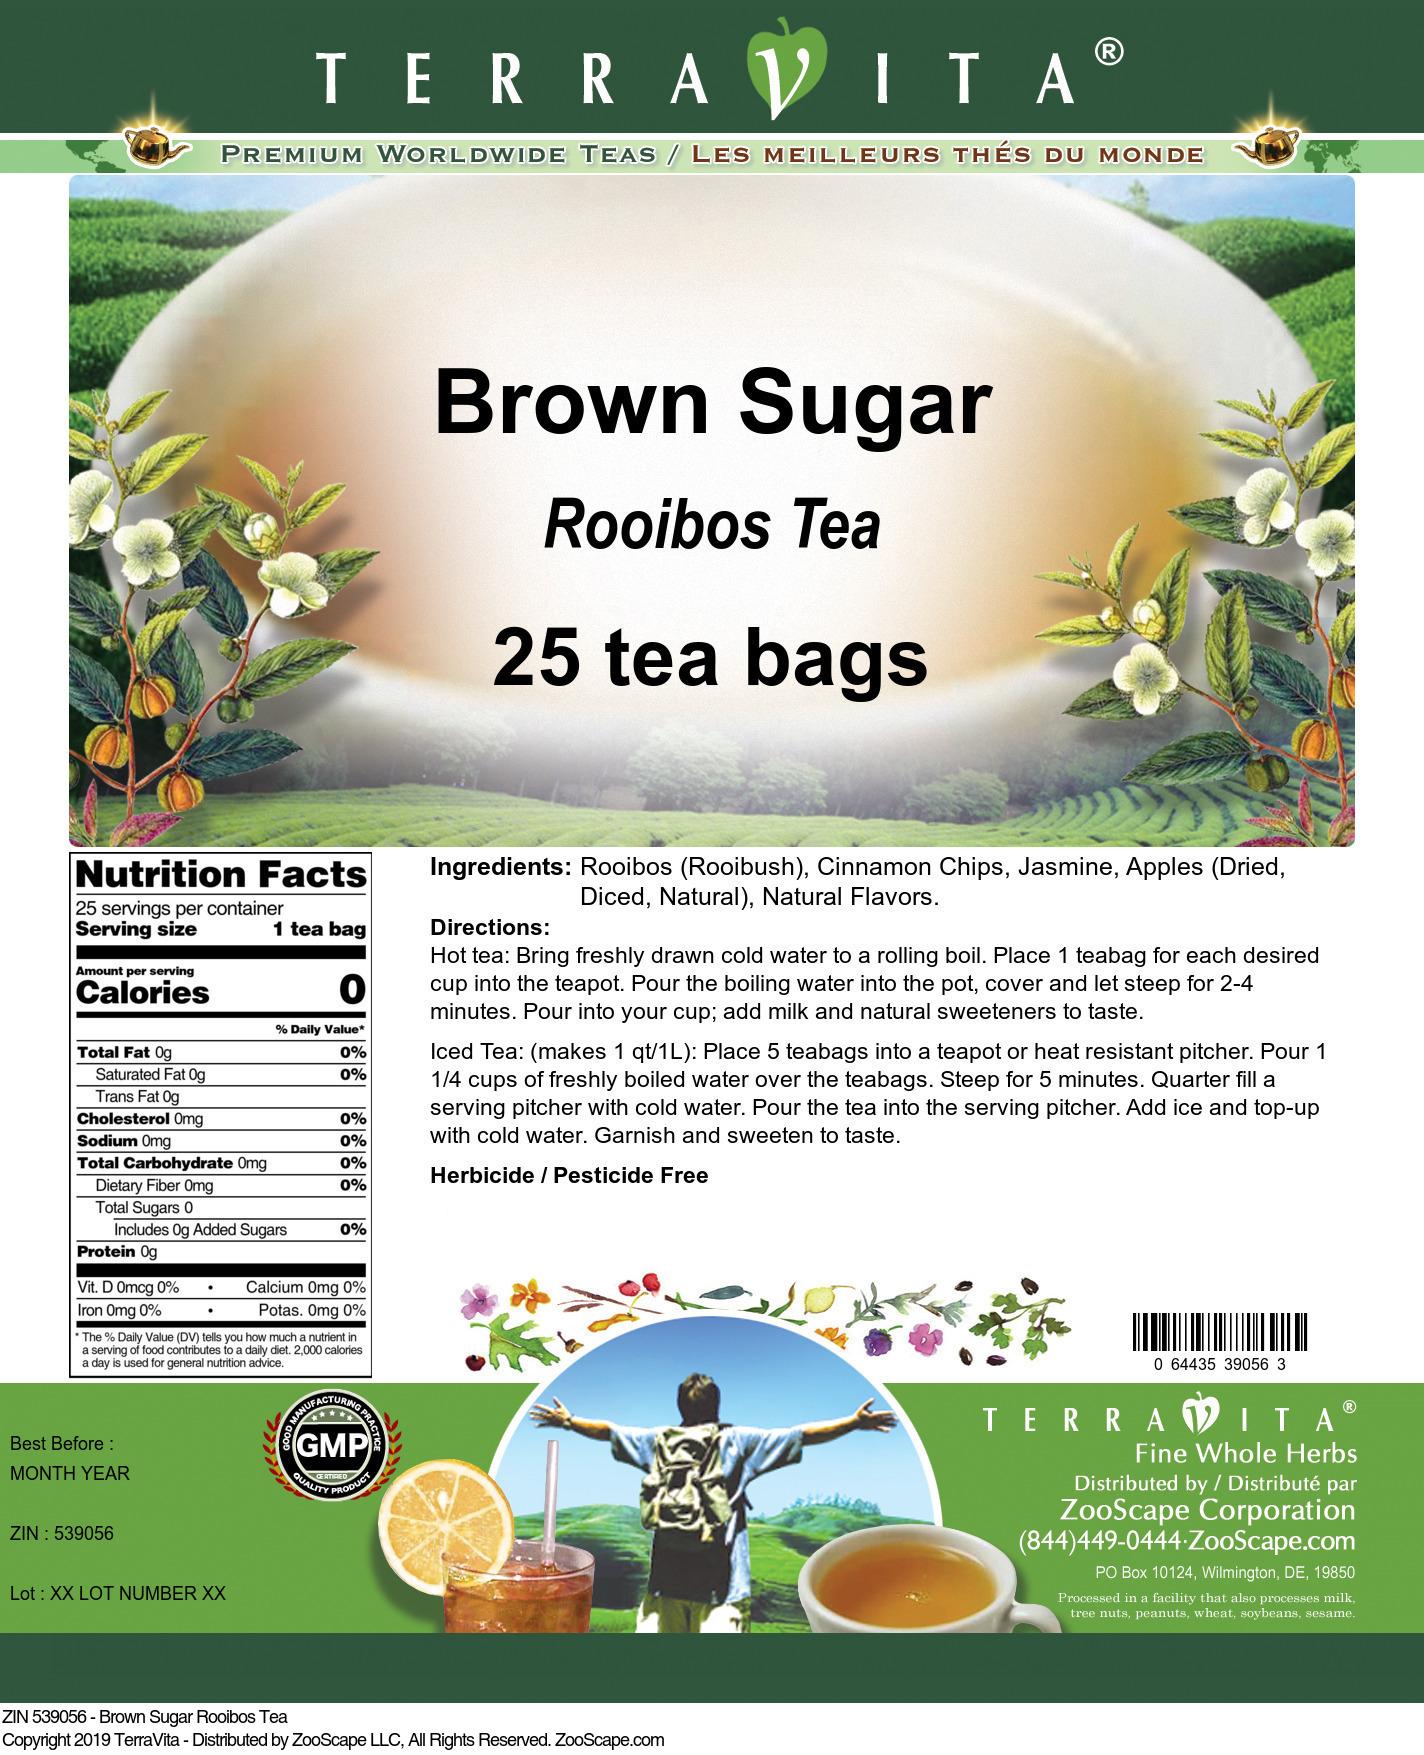 Brown Sugar Rooibos Tea